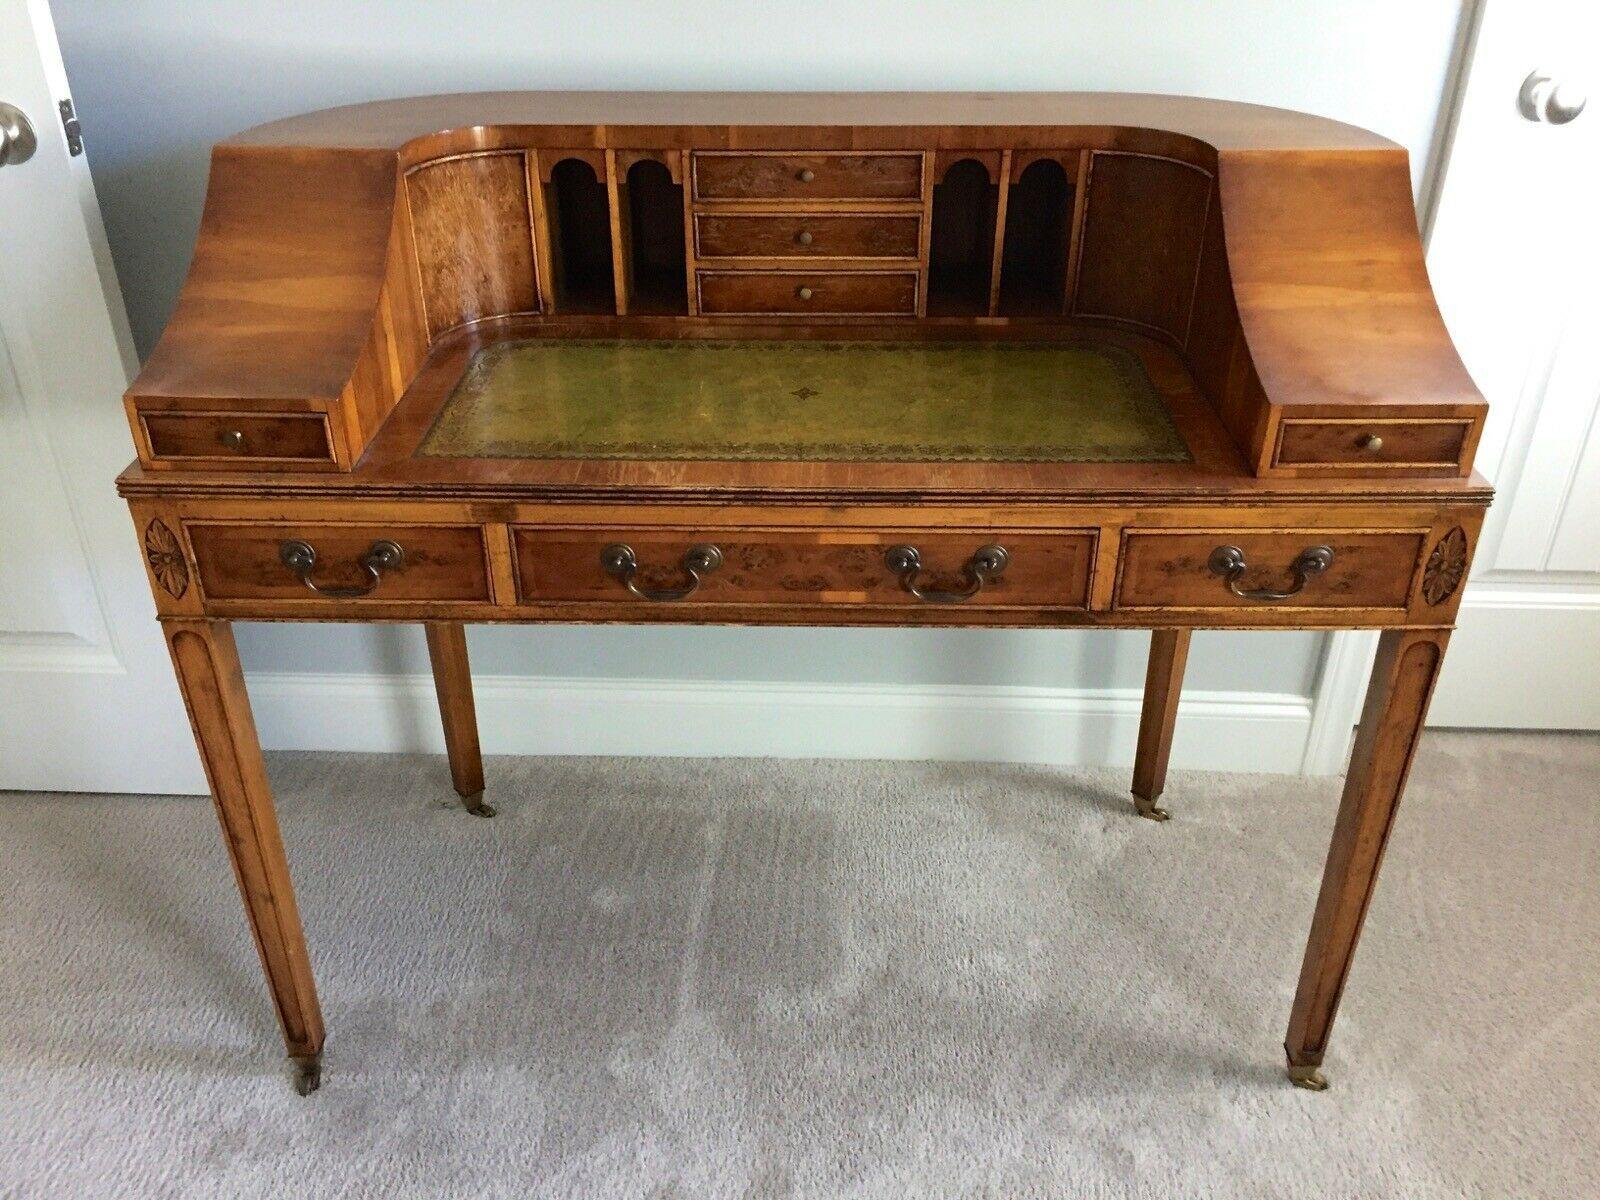 Federal Style Carlton Type Vintage Writing Desk Vintage Writing Desk Rustic Writing Desk Vintage Writing